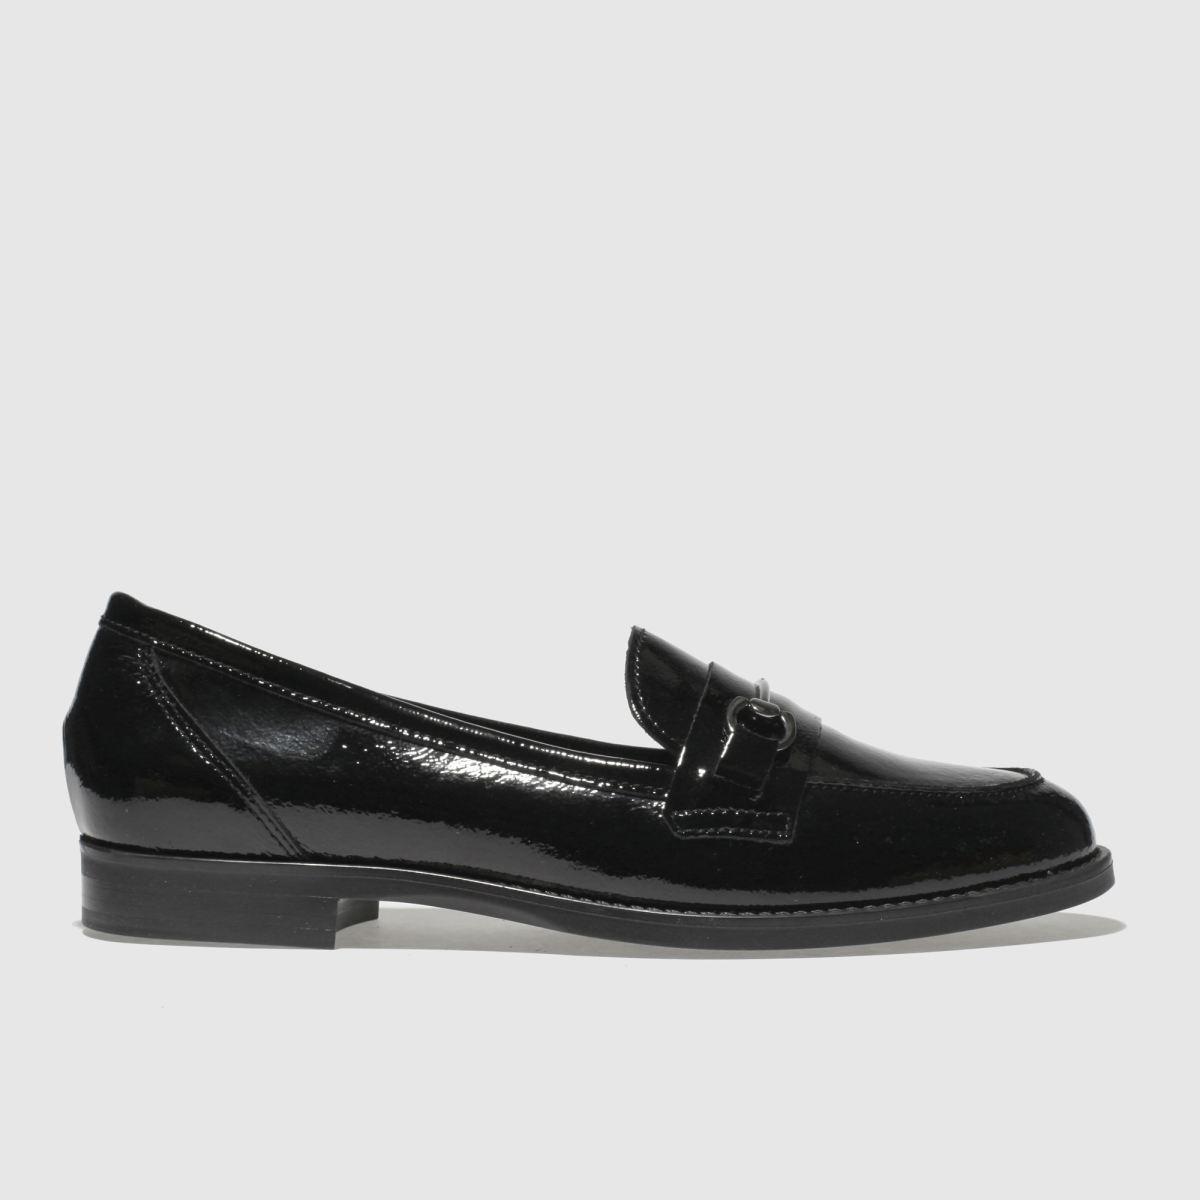 Schuh Black Infinity Flat Shoes